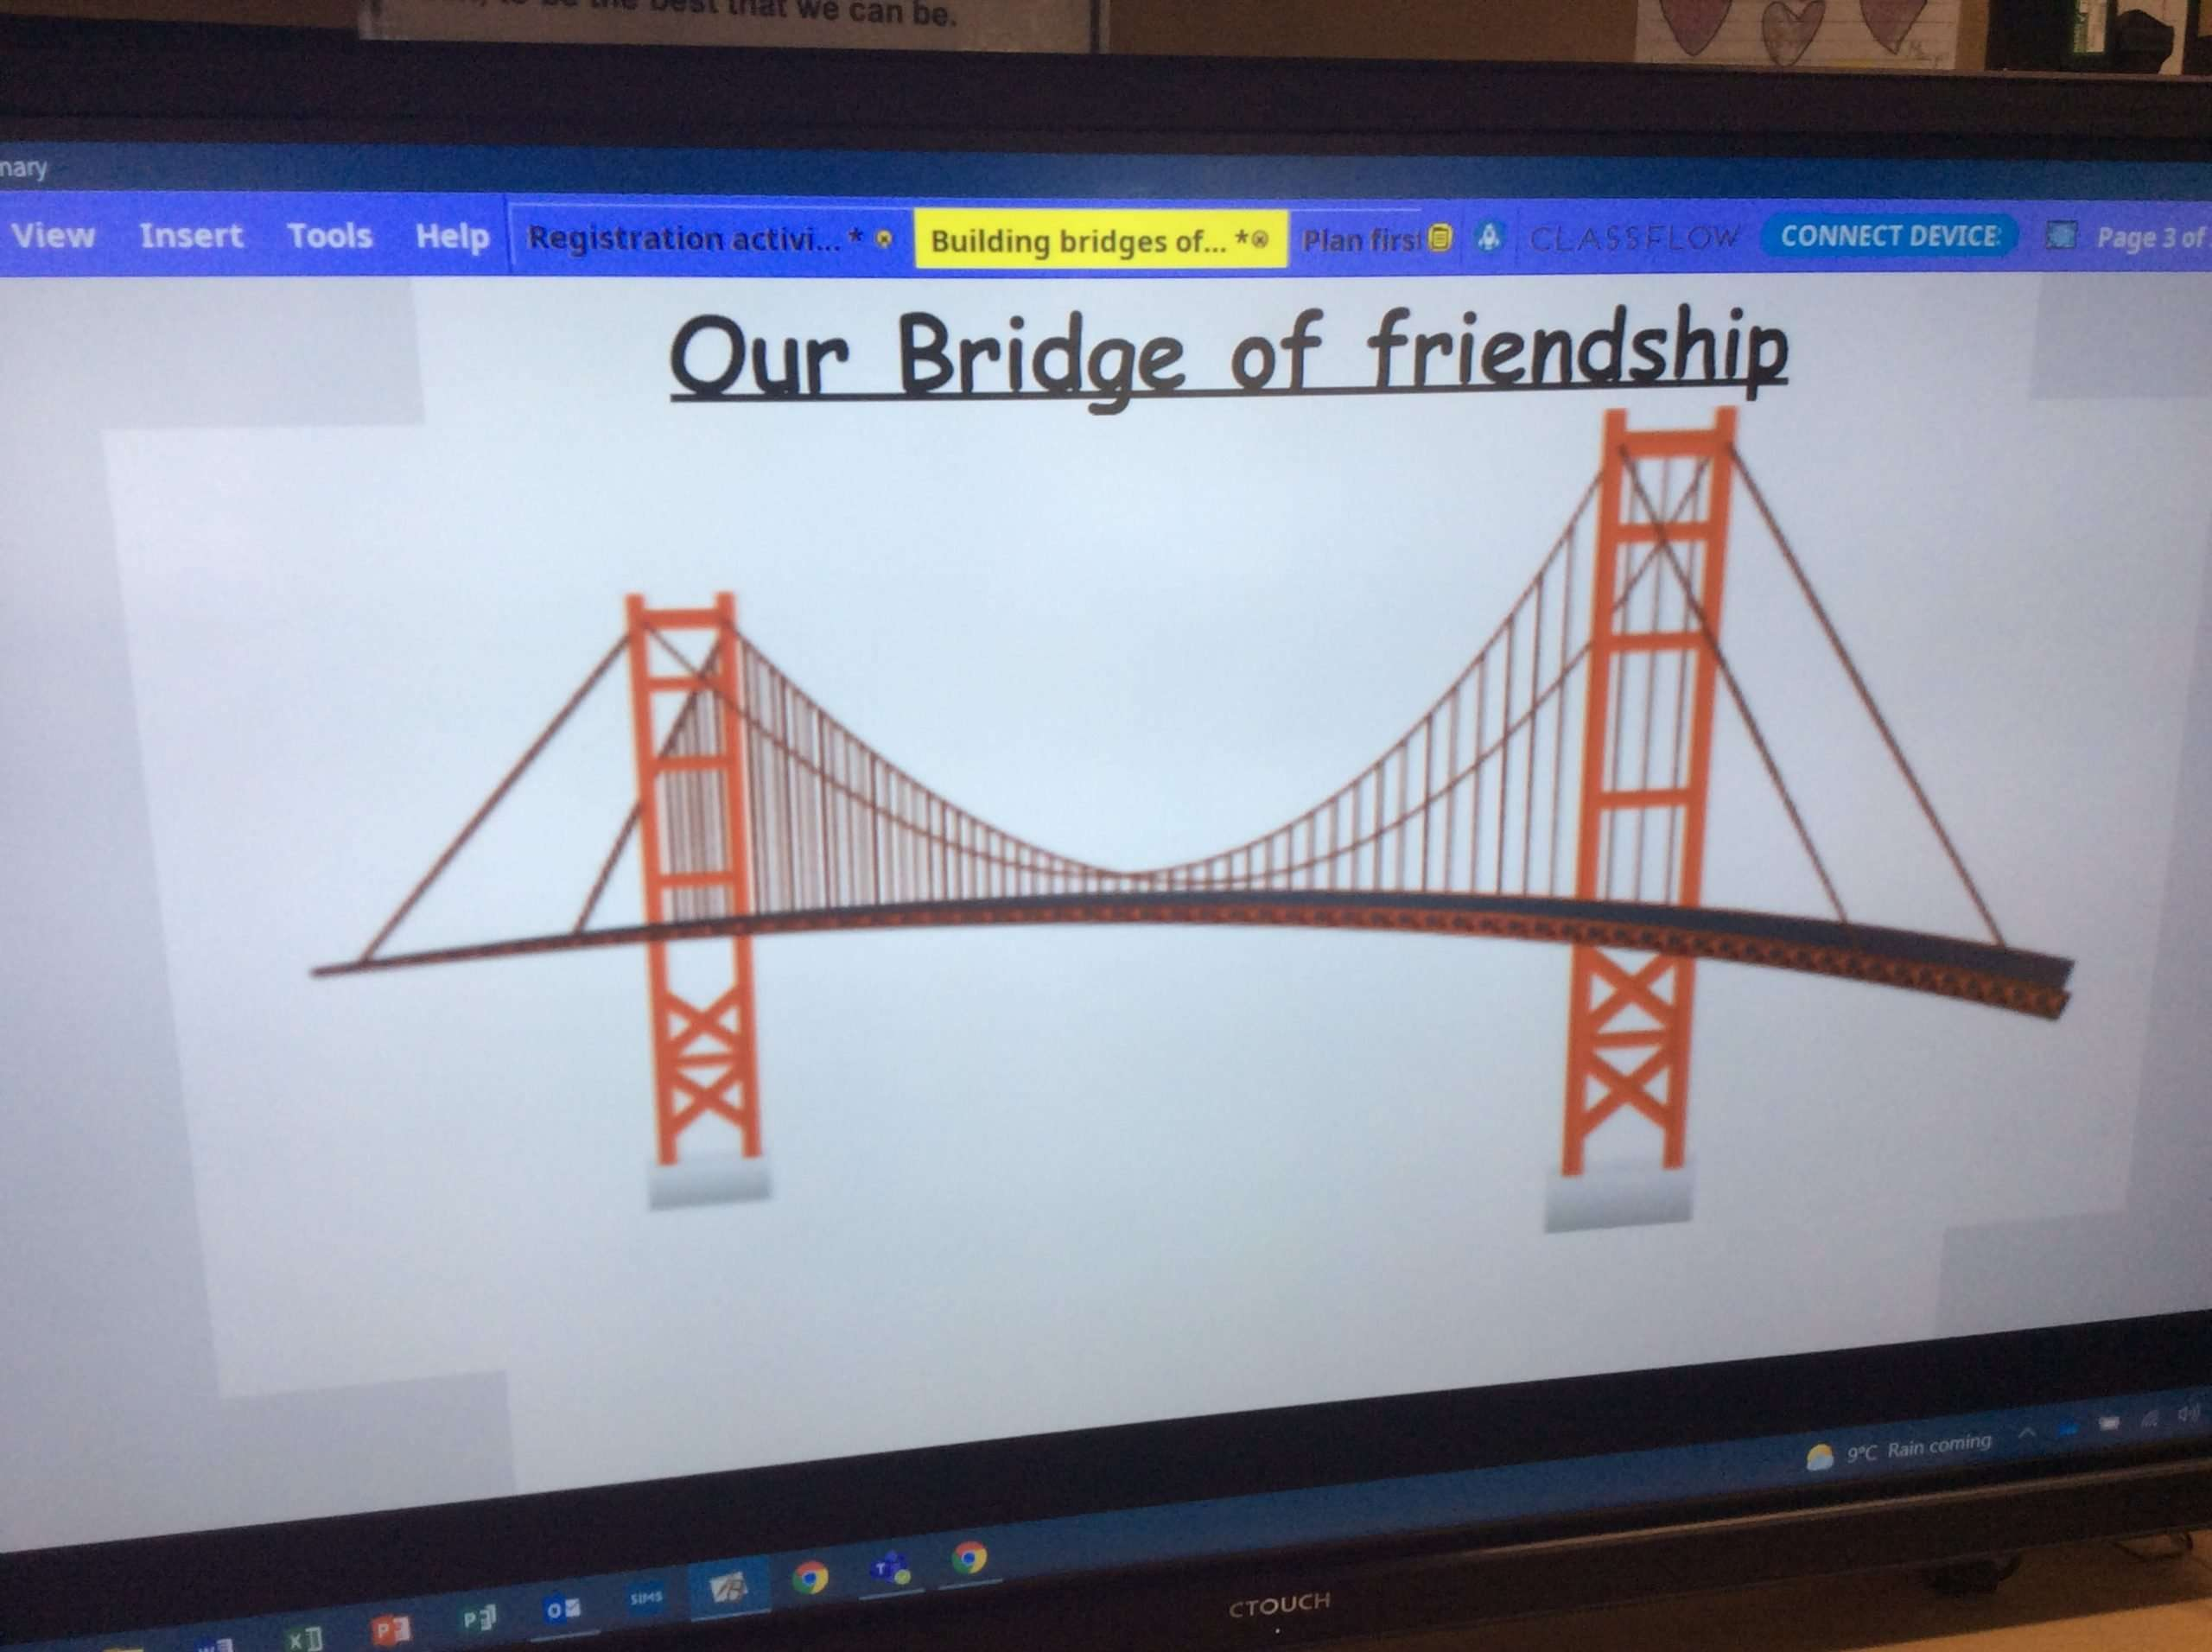 Our bridge of friendship